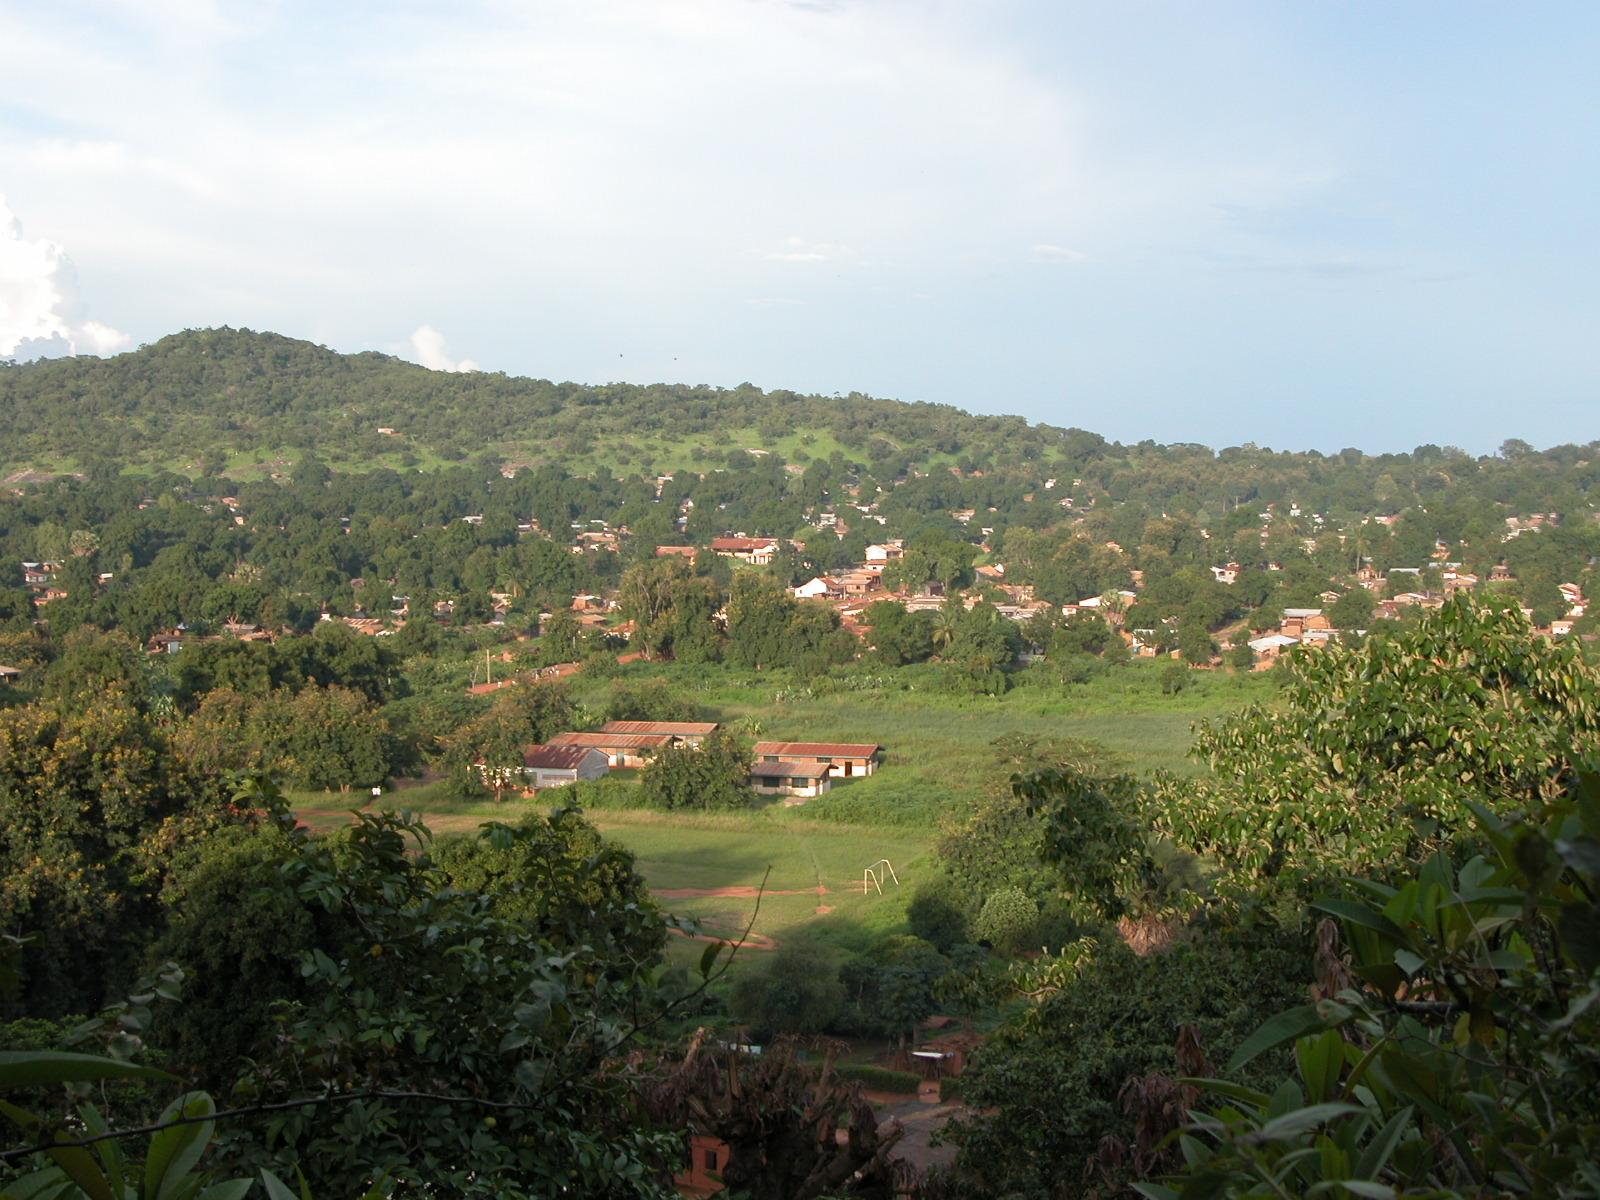 произведен центральная африка фото приготовления